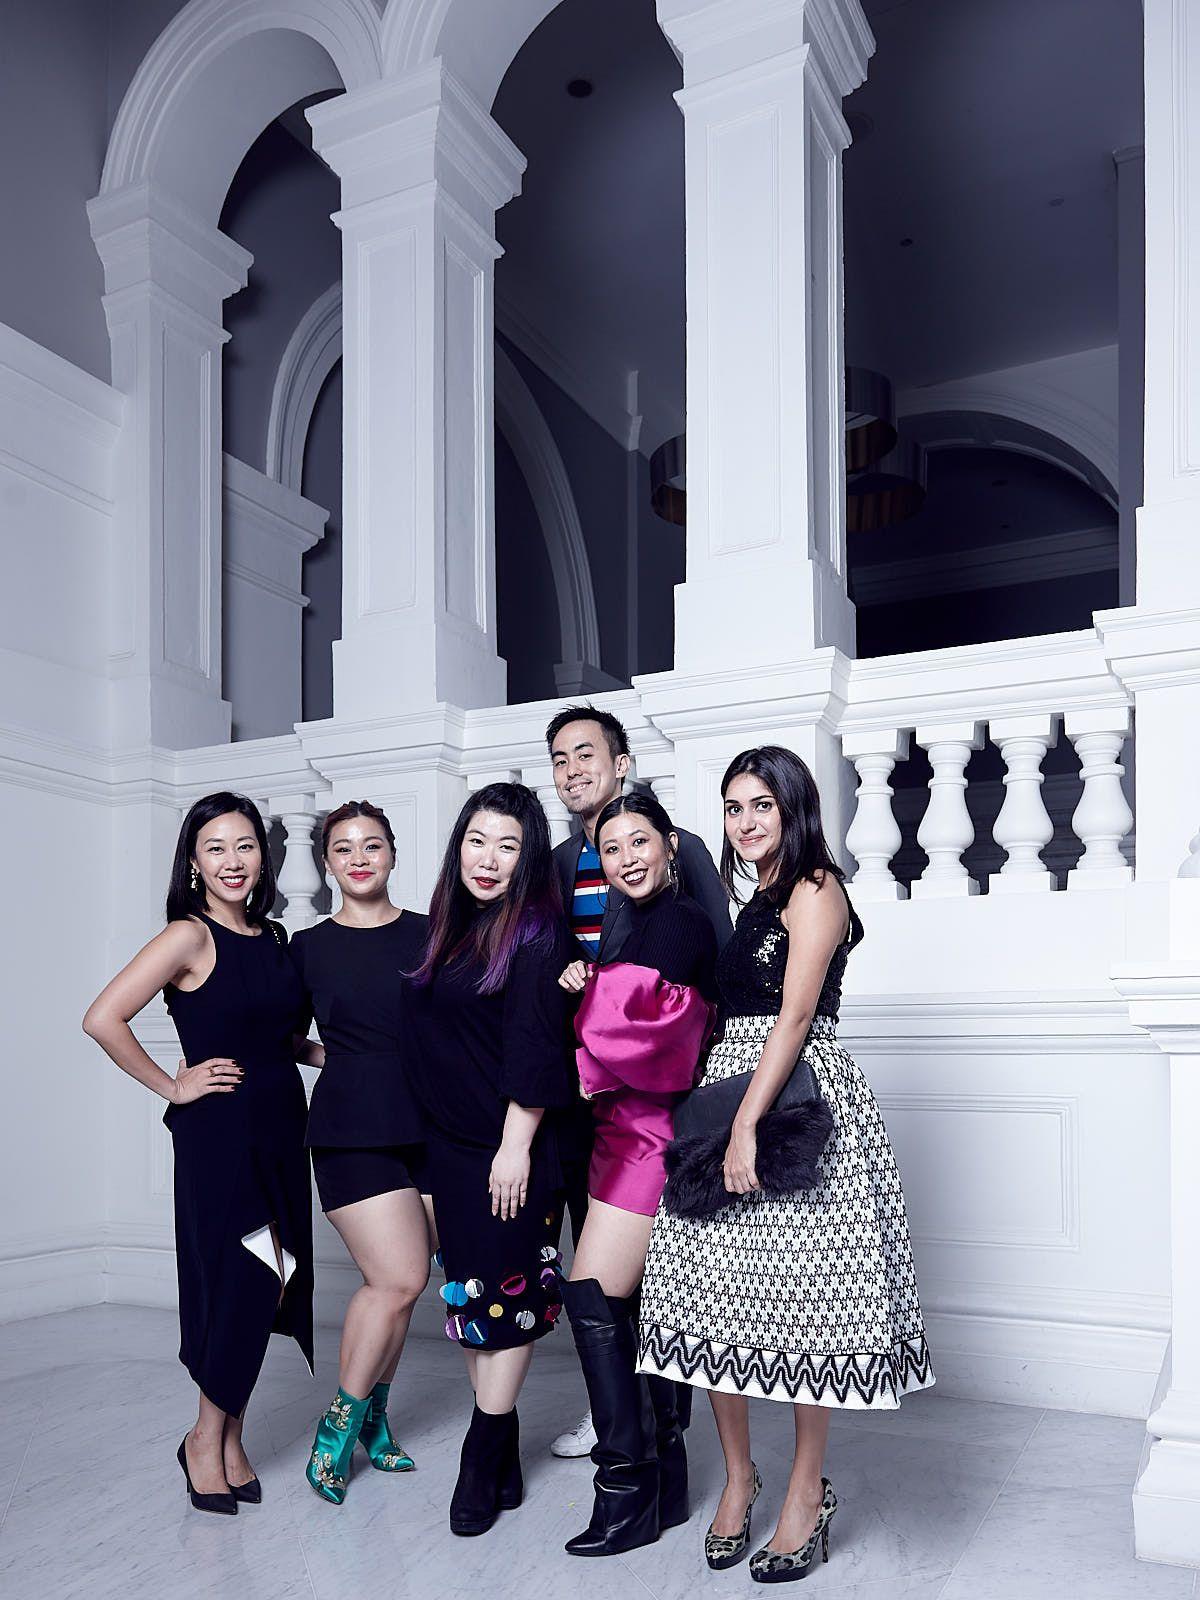 Kissa Castañeda, Nicolette Wong, Elizabeth Lee, Terence Lim, Cheryl Chan, Karishma Tulsidas